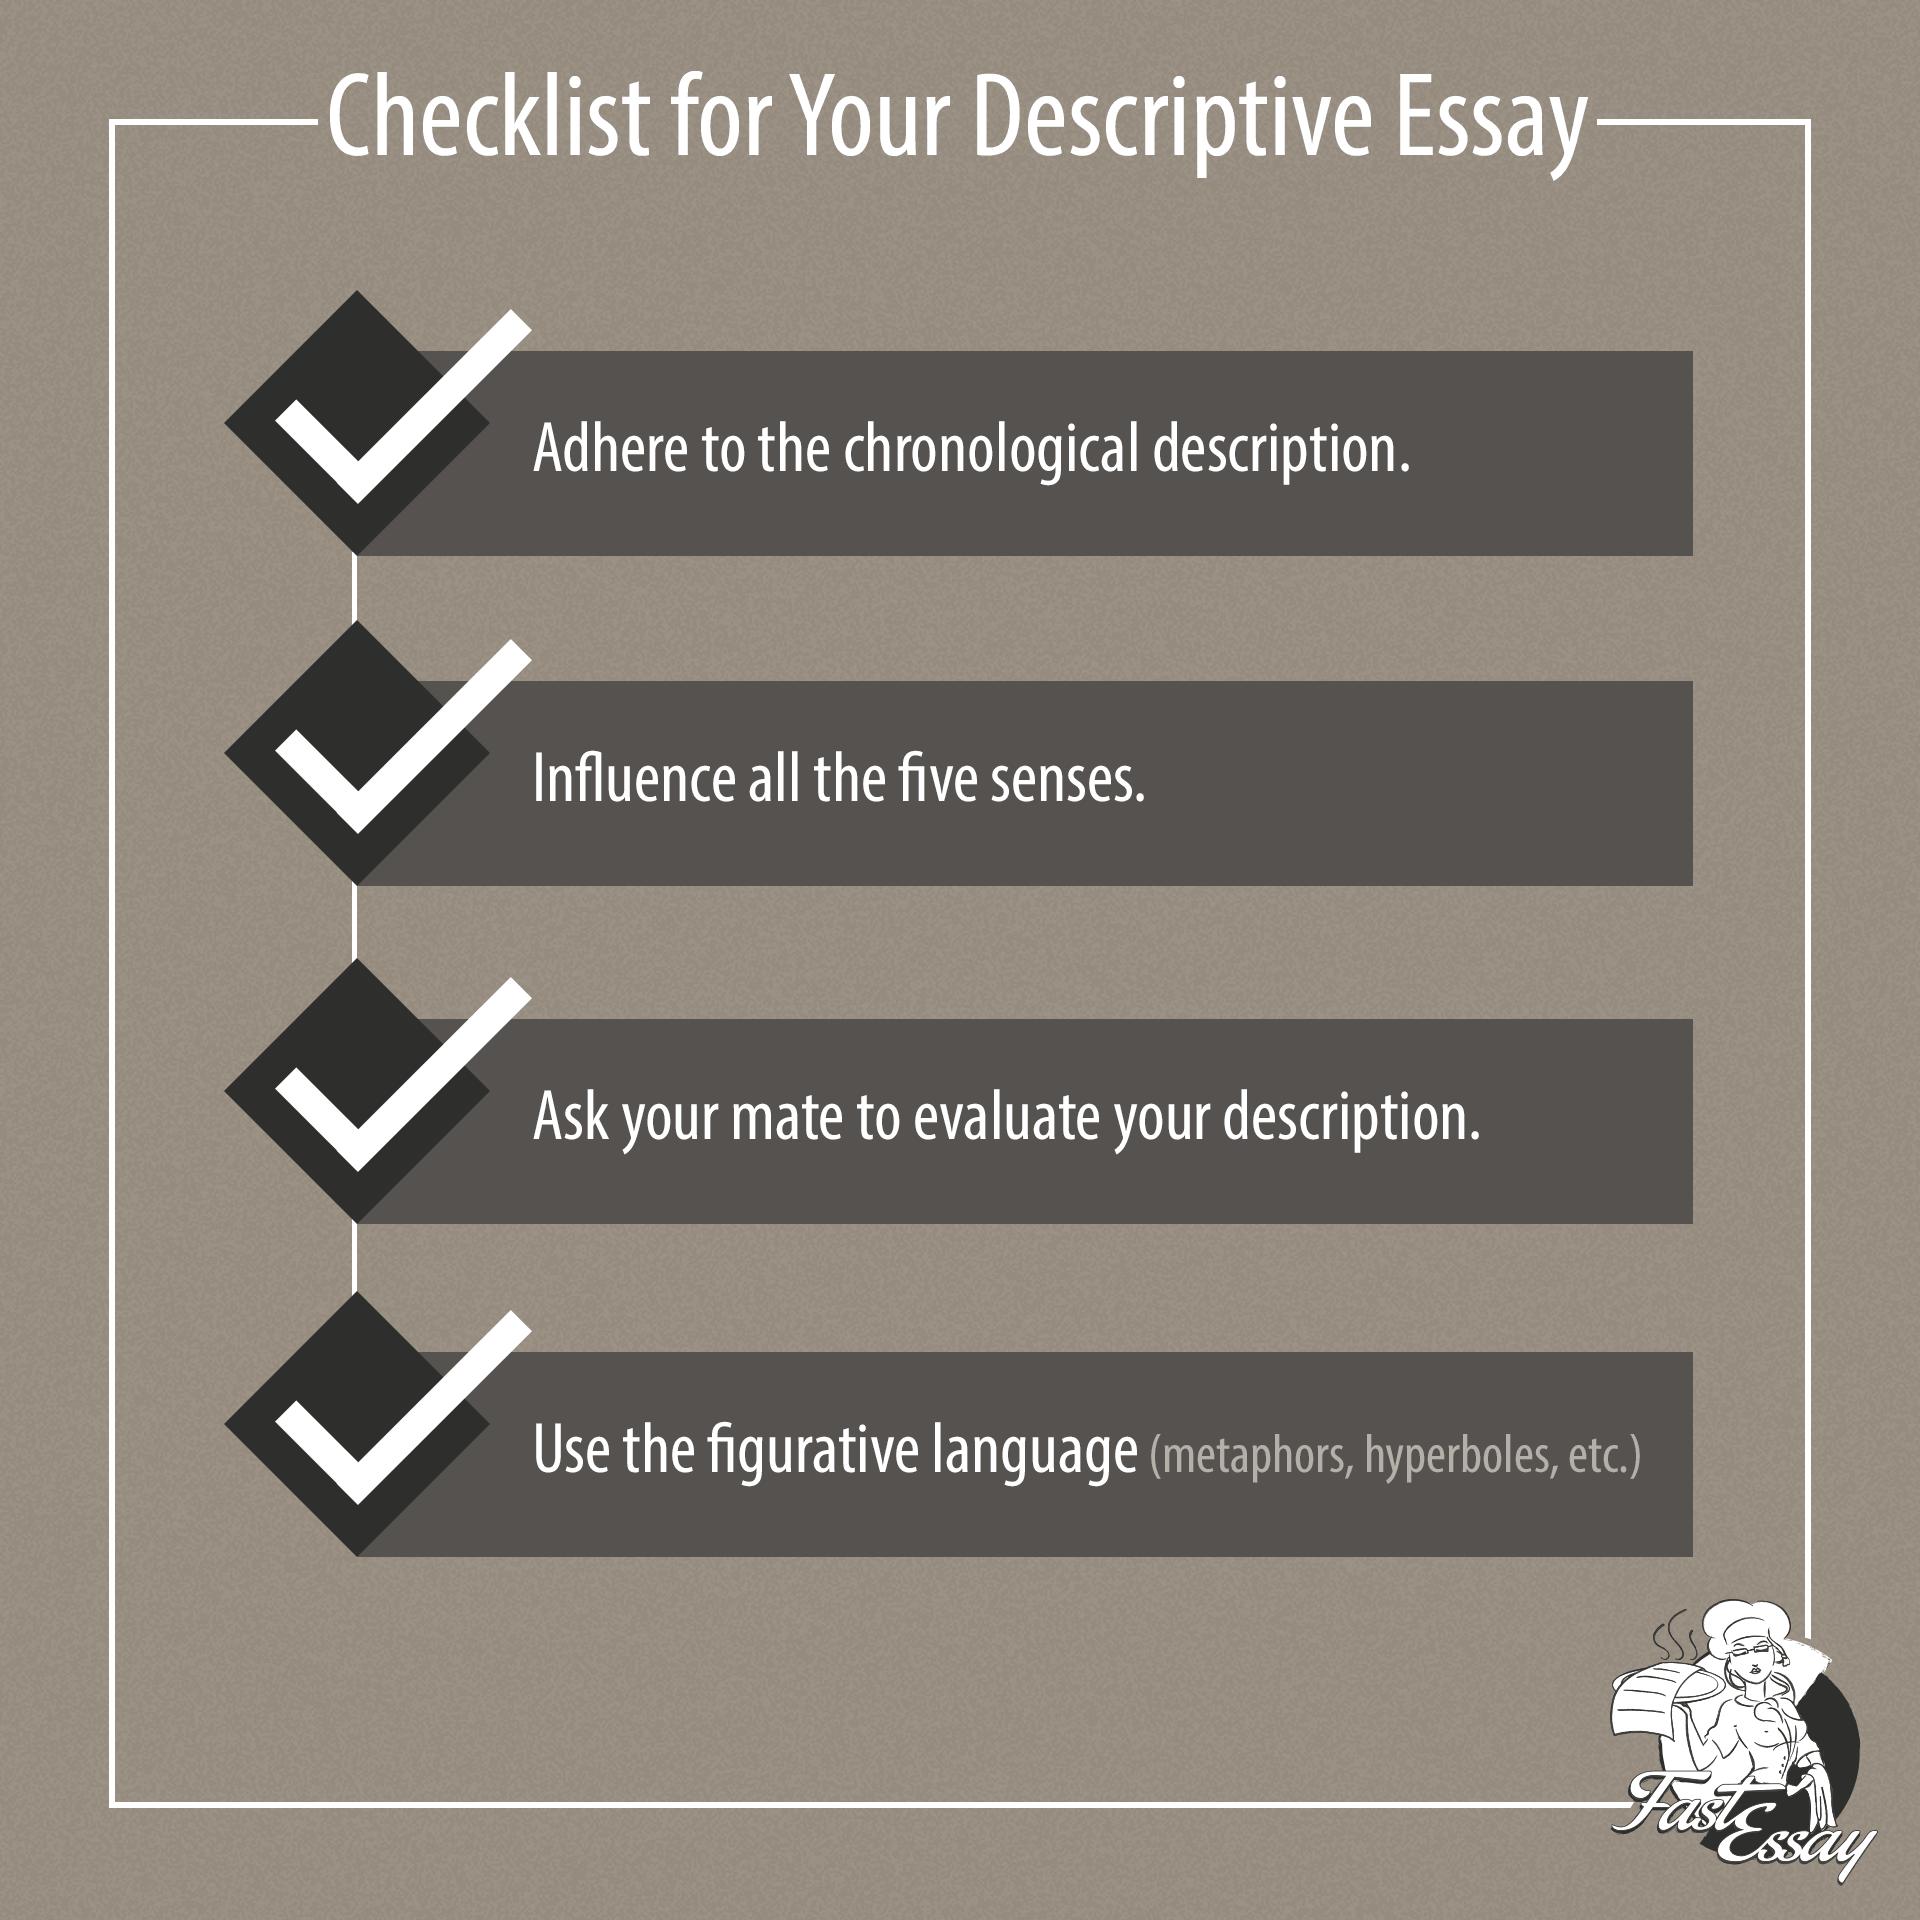 Checklist for a descriptive test